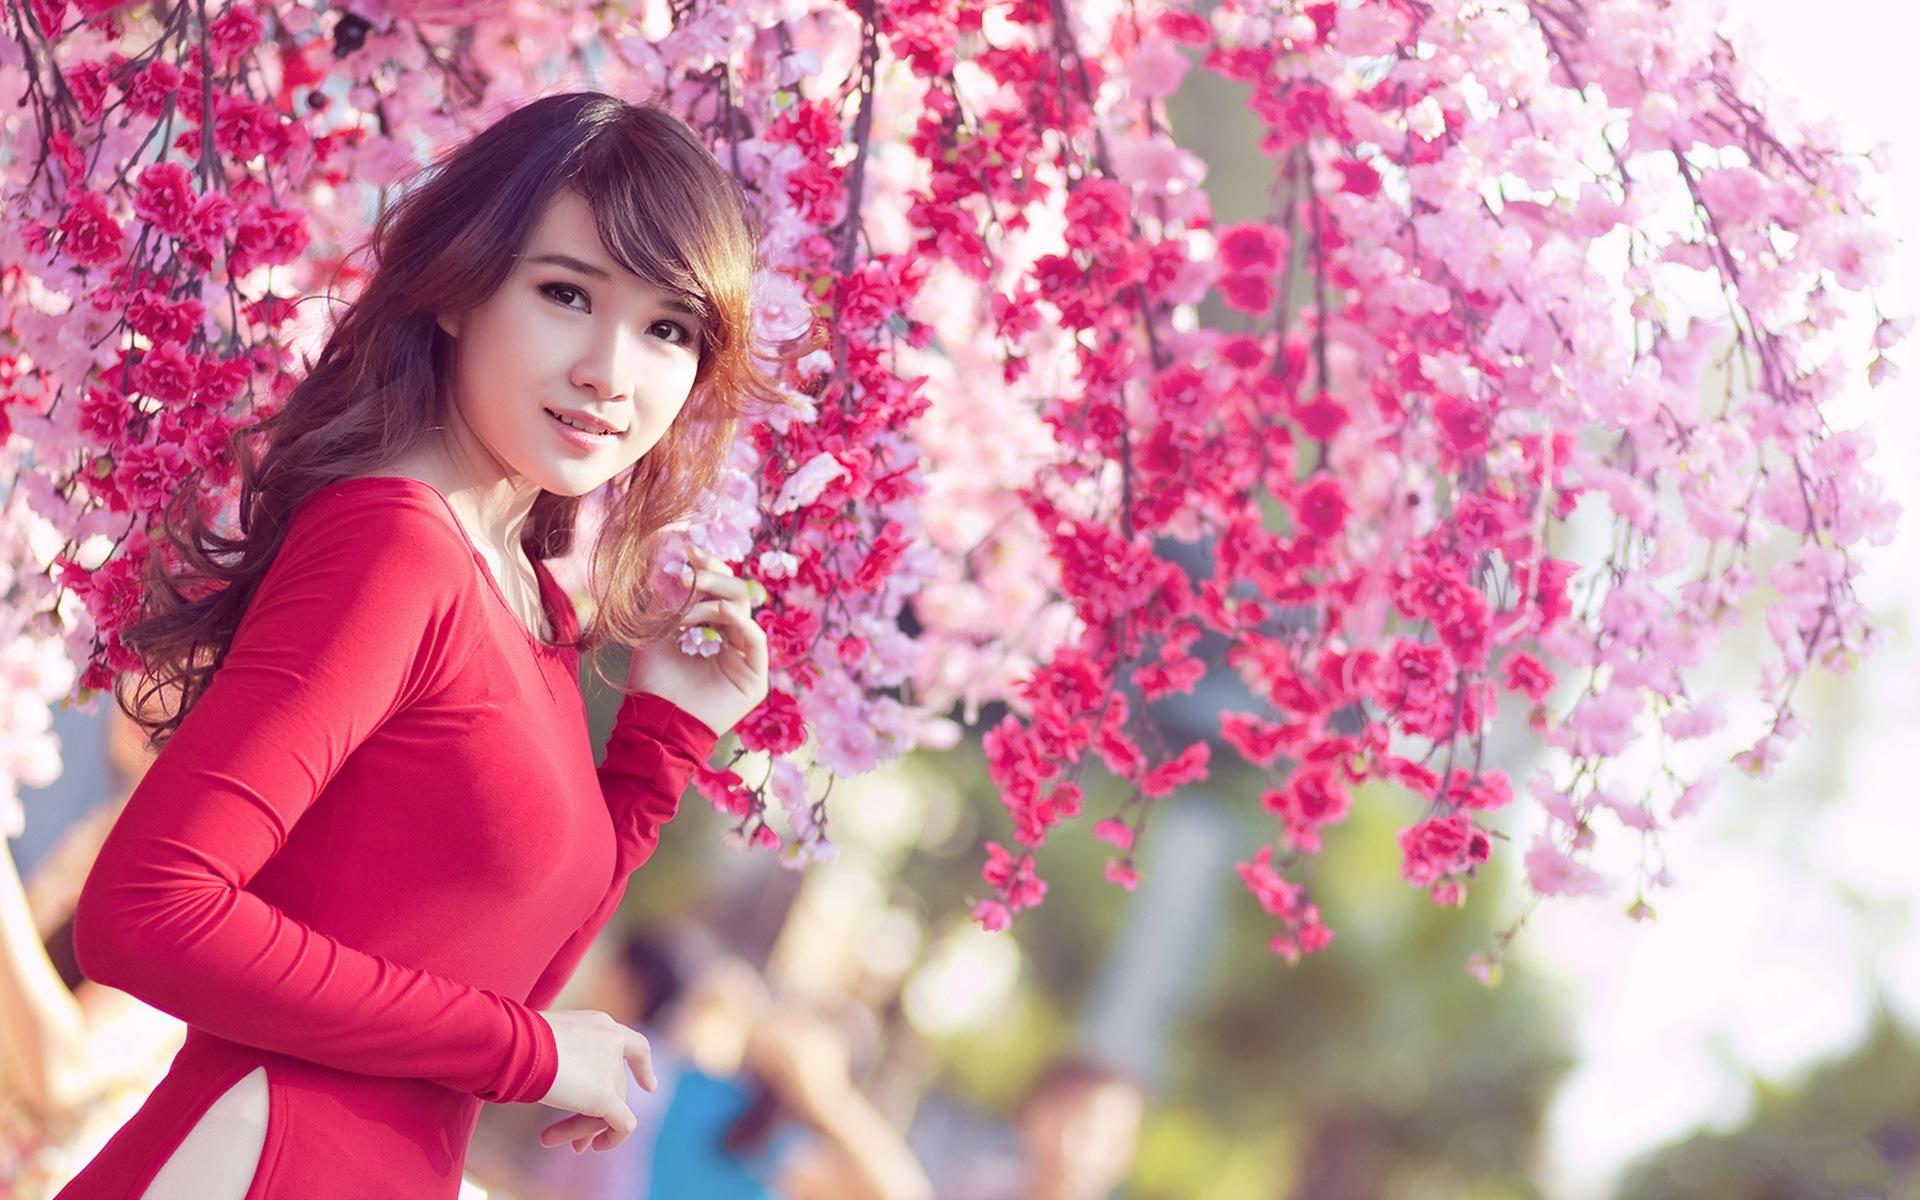 Beautiful Chinese Girl Paintings Widescreen Wallpaper Beautiful Full Hd Wallpaper And Background Image